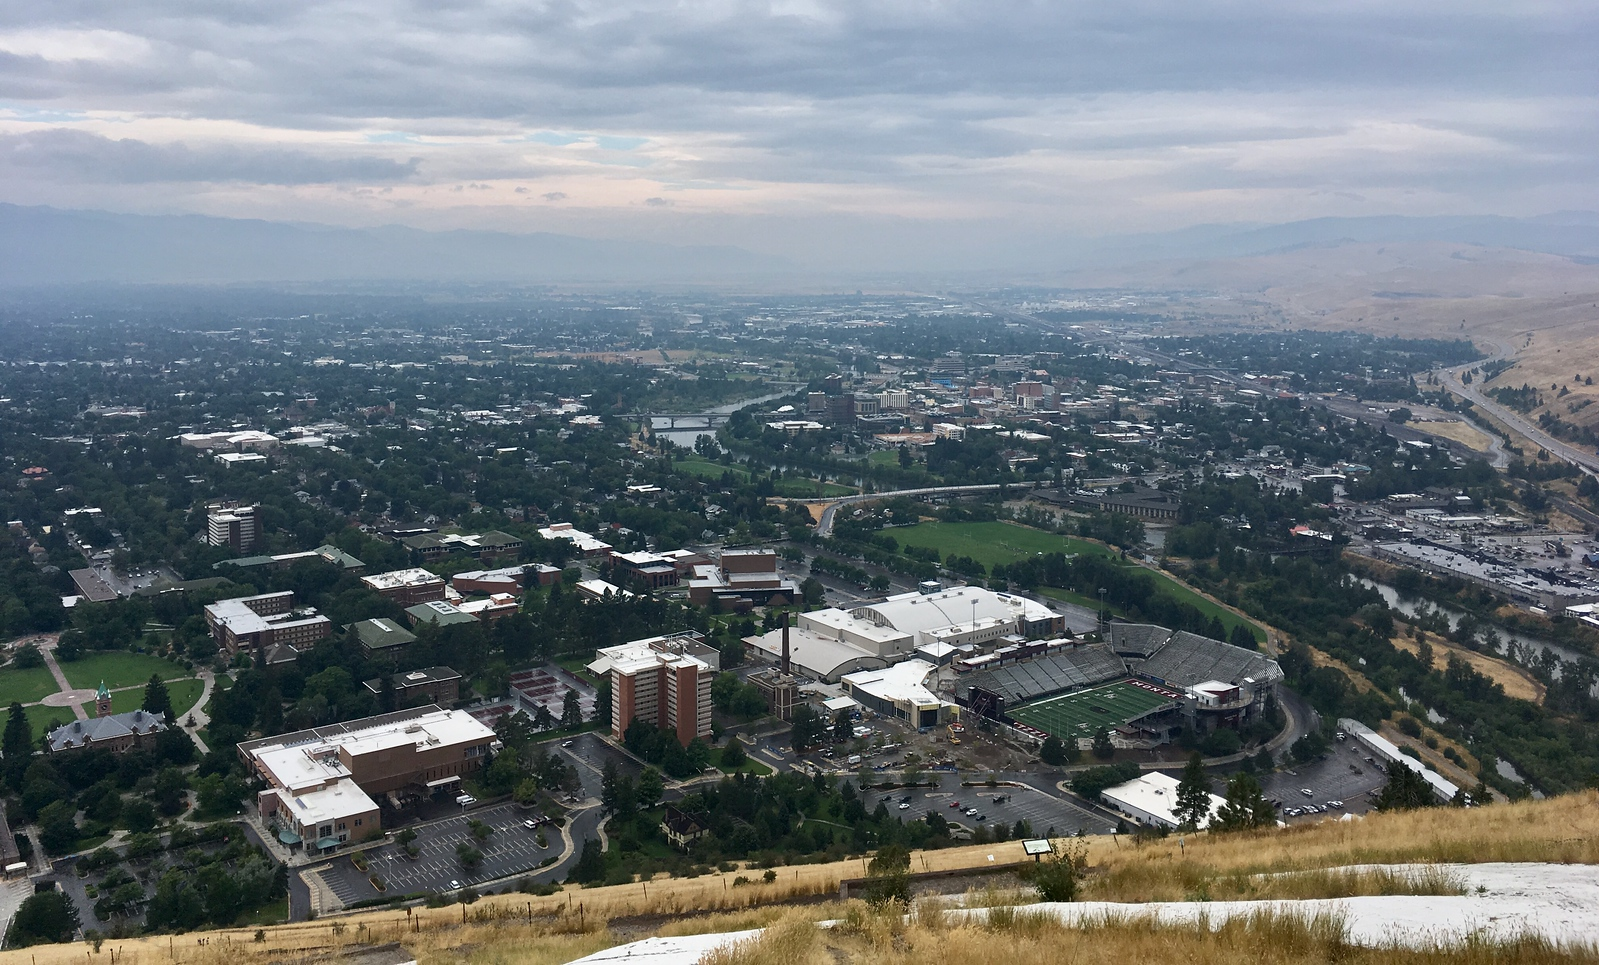 University of Montana in Missoula